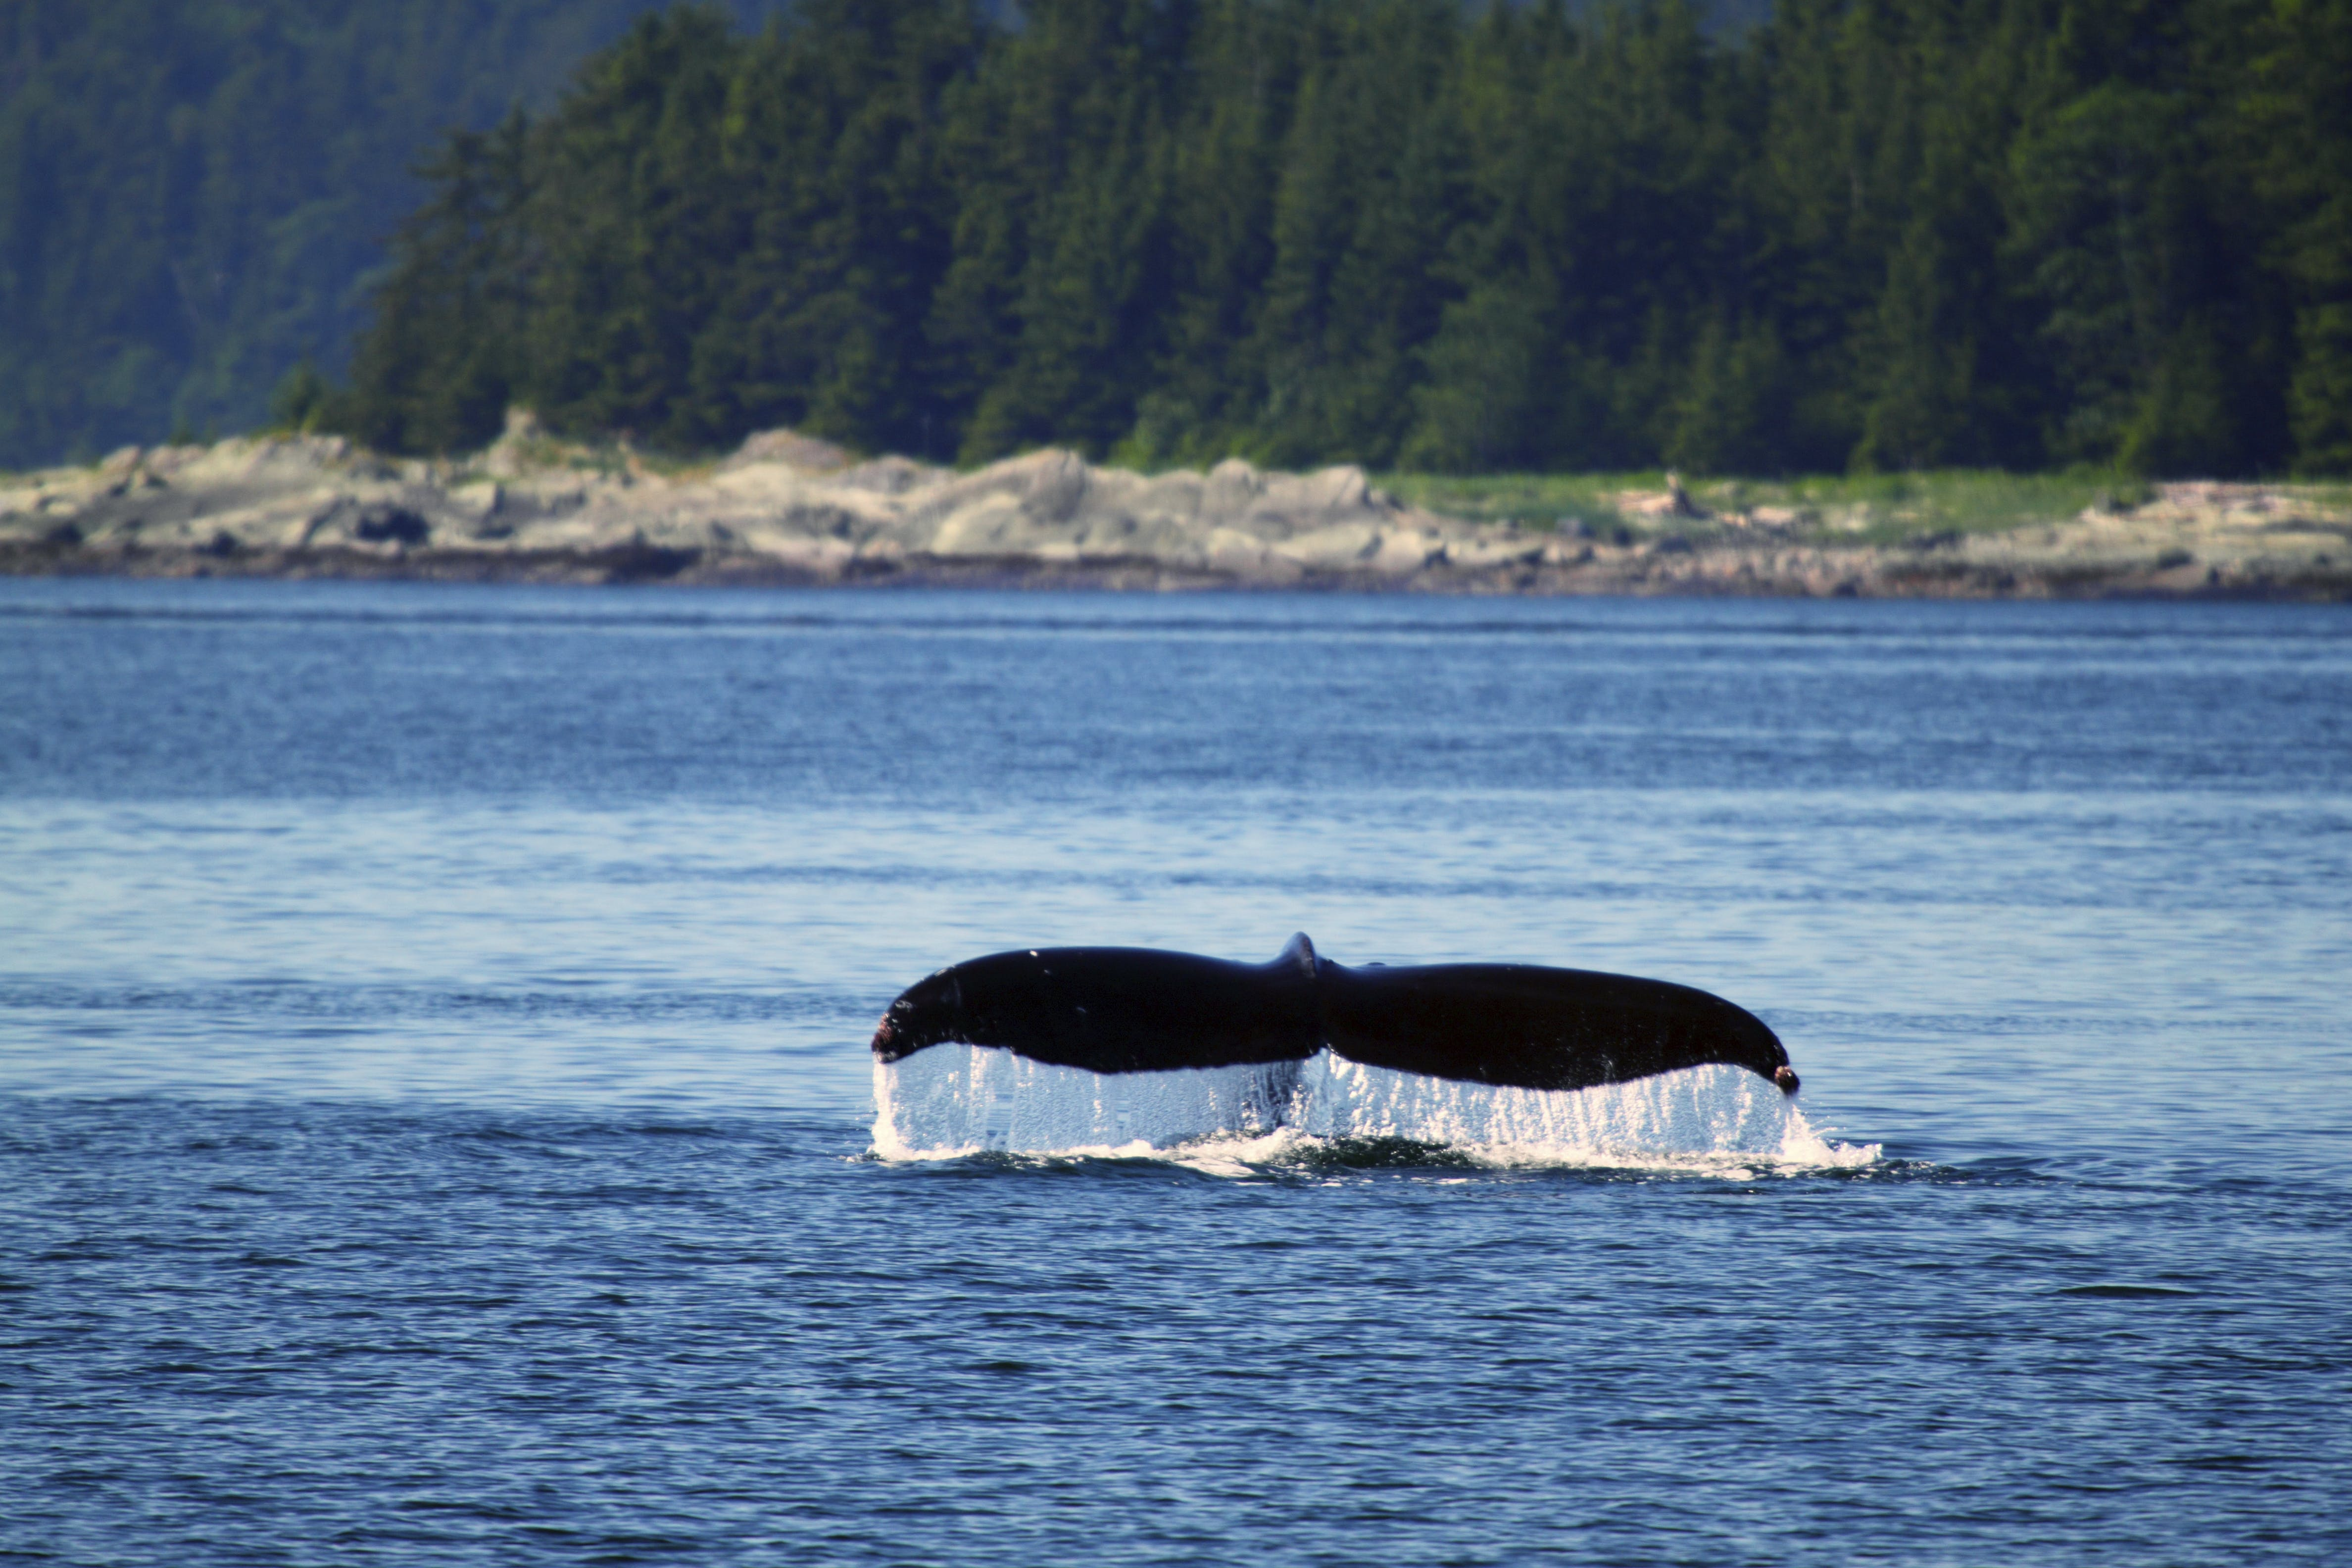 Alaska whales breaching